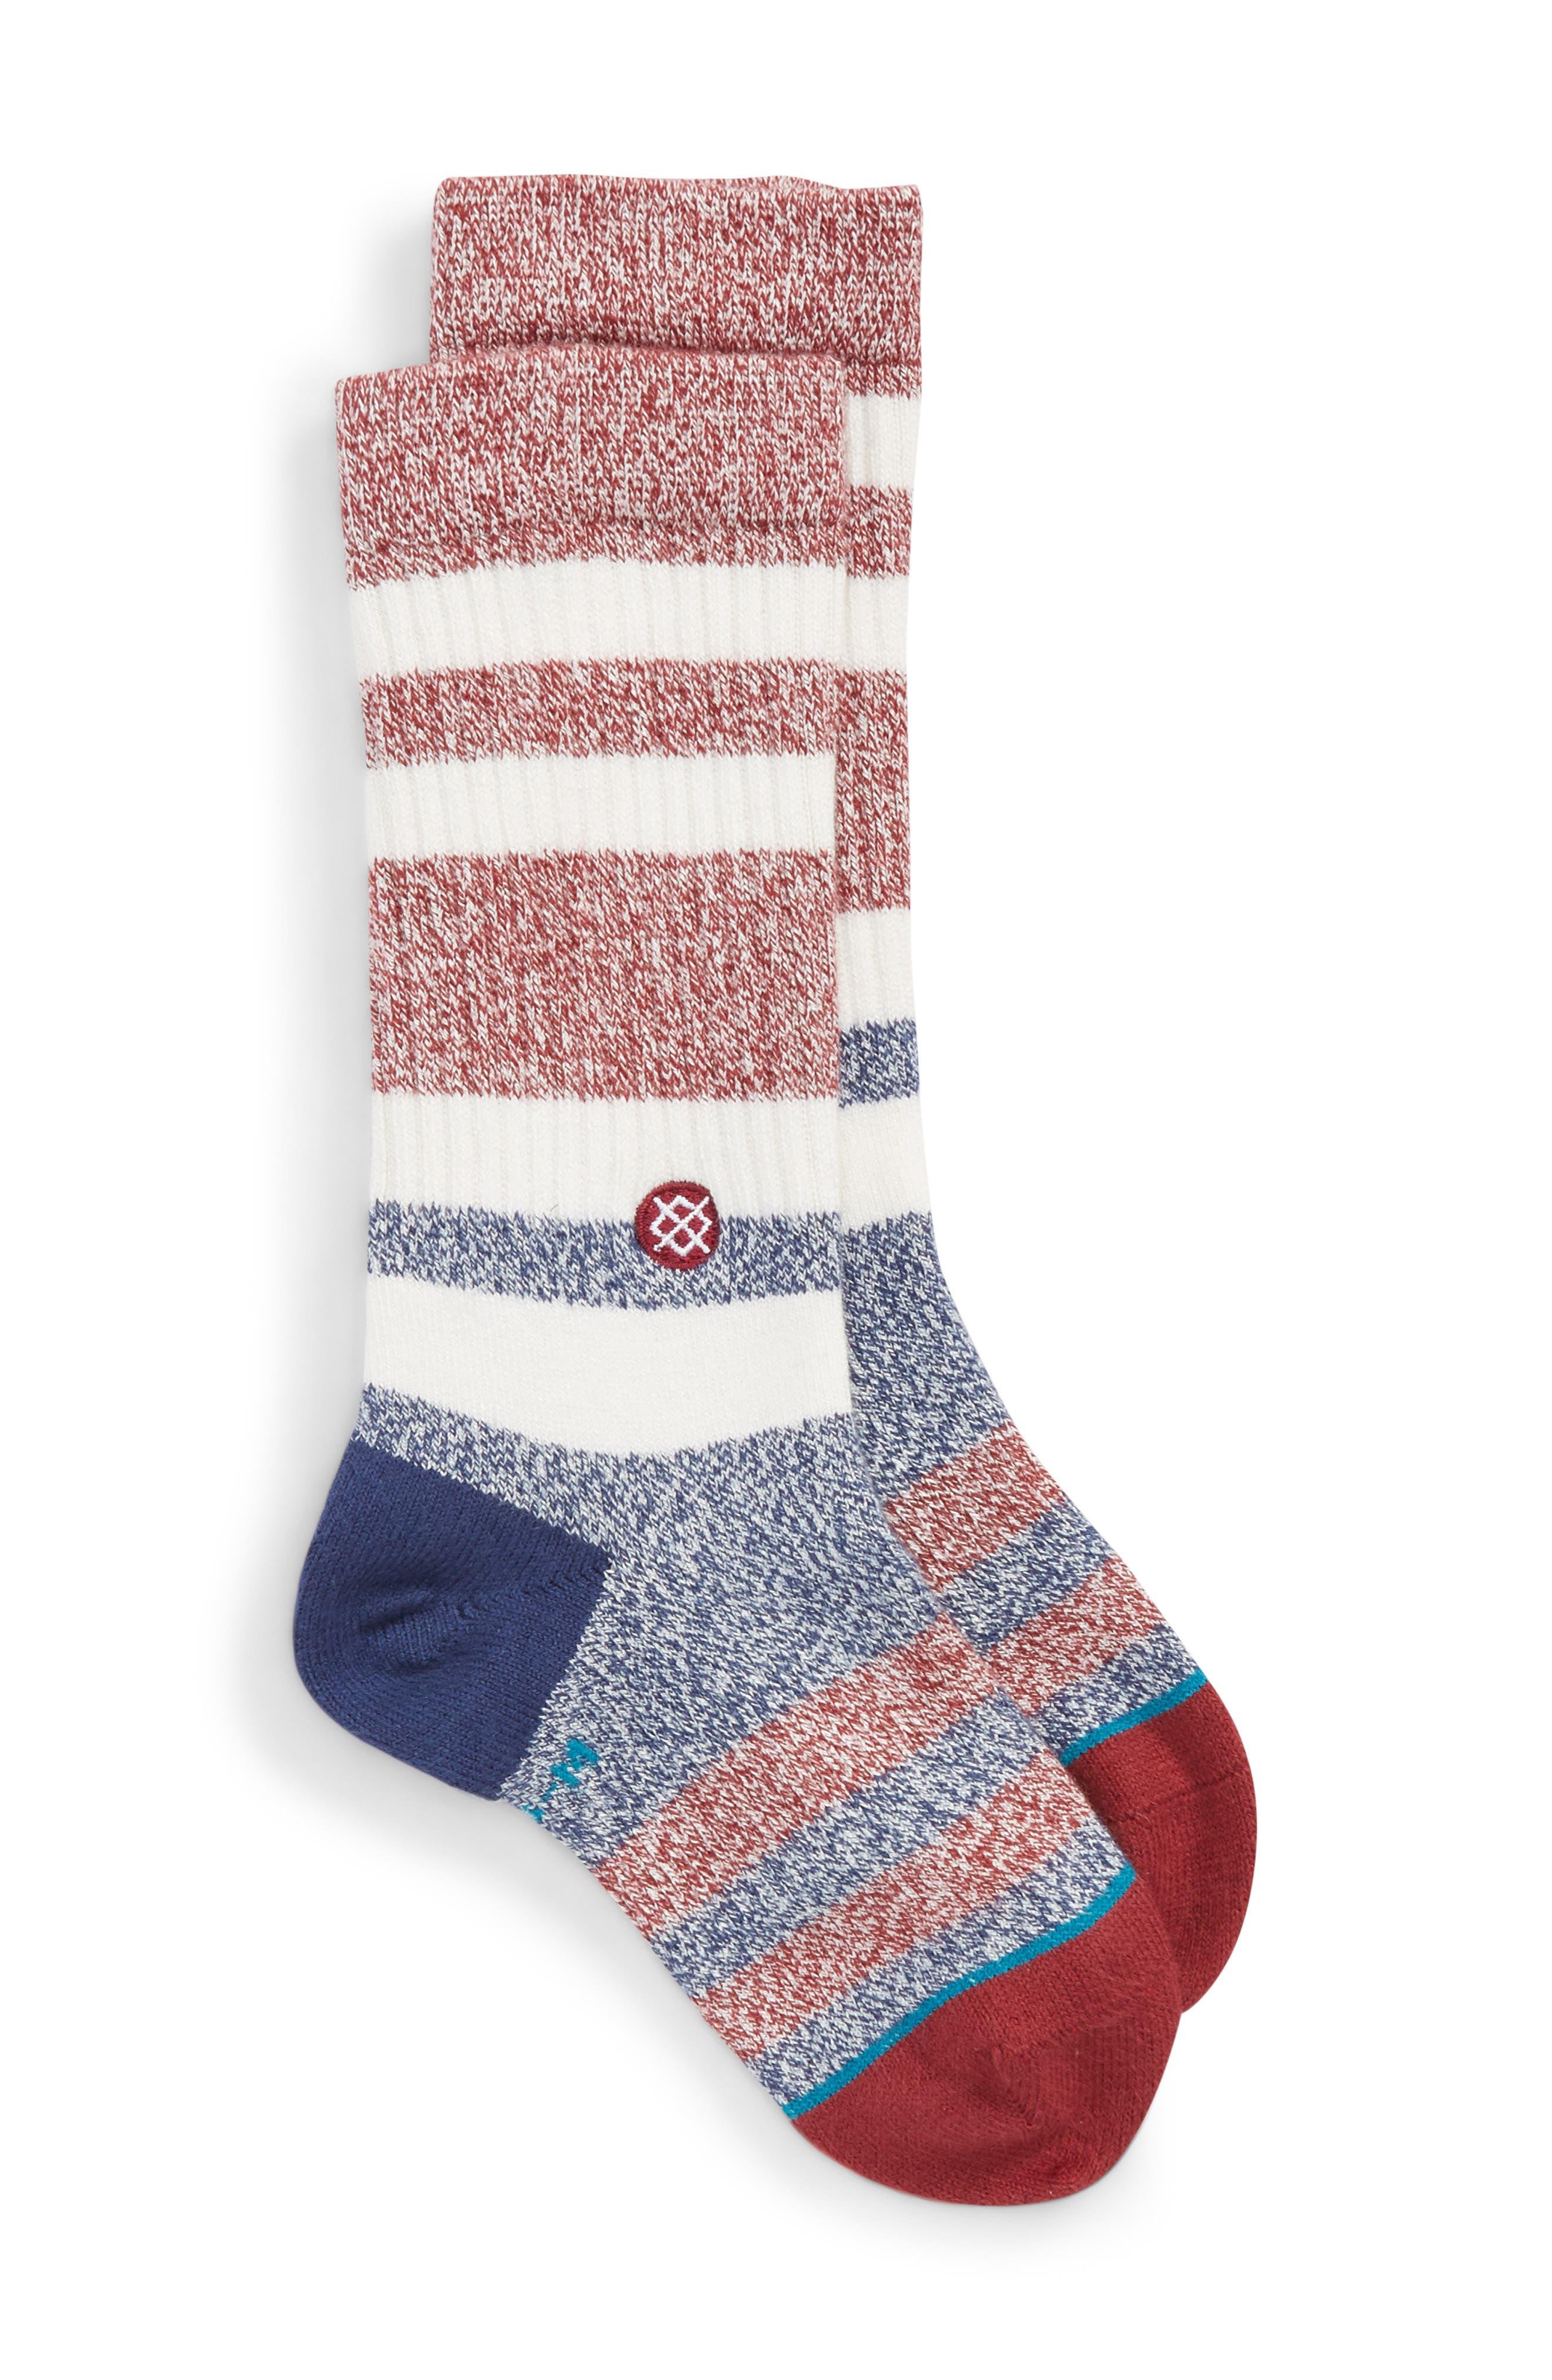 Robinsen Stripe Socks,                             Main thumbnail 1, color,                             Red